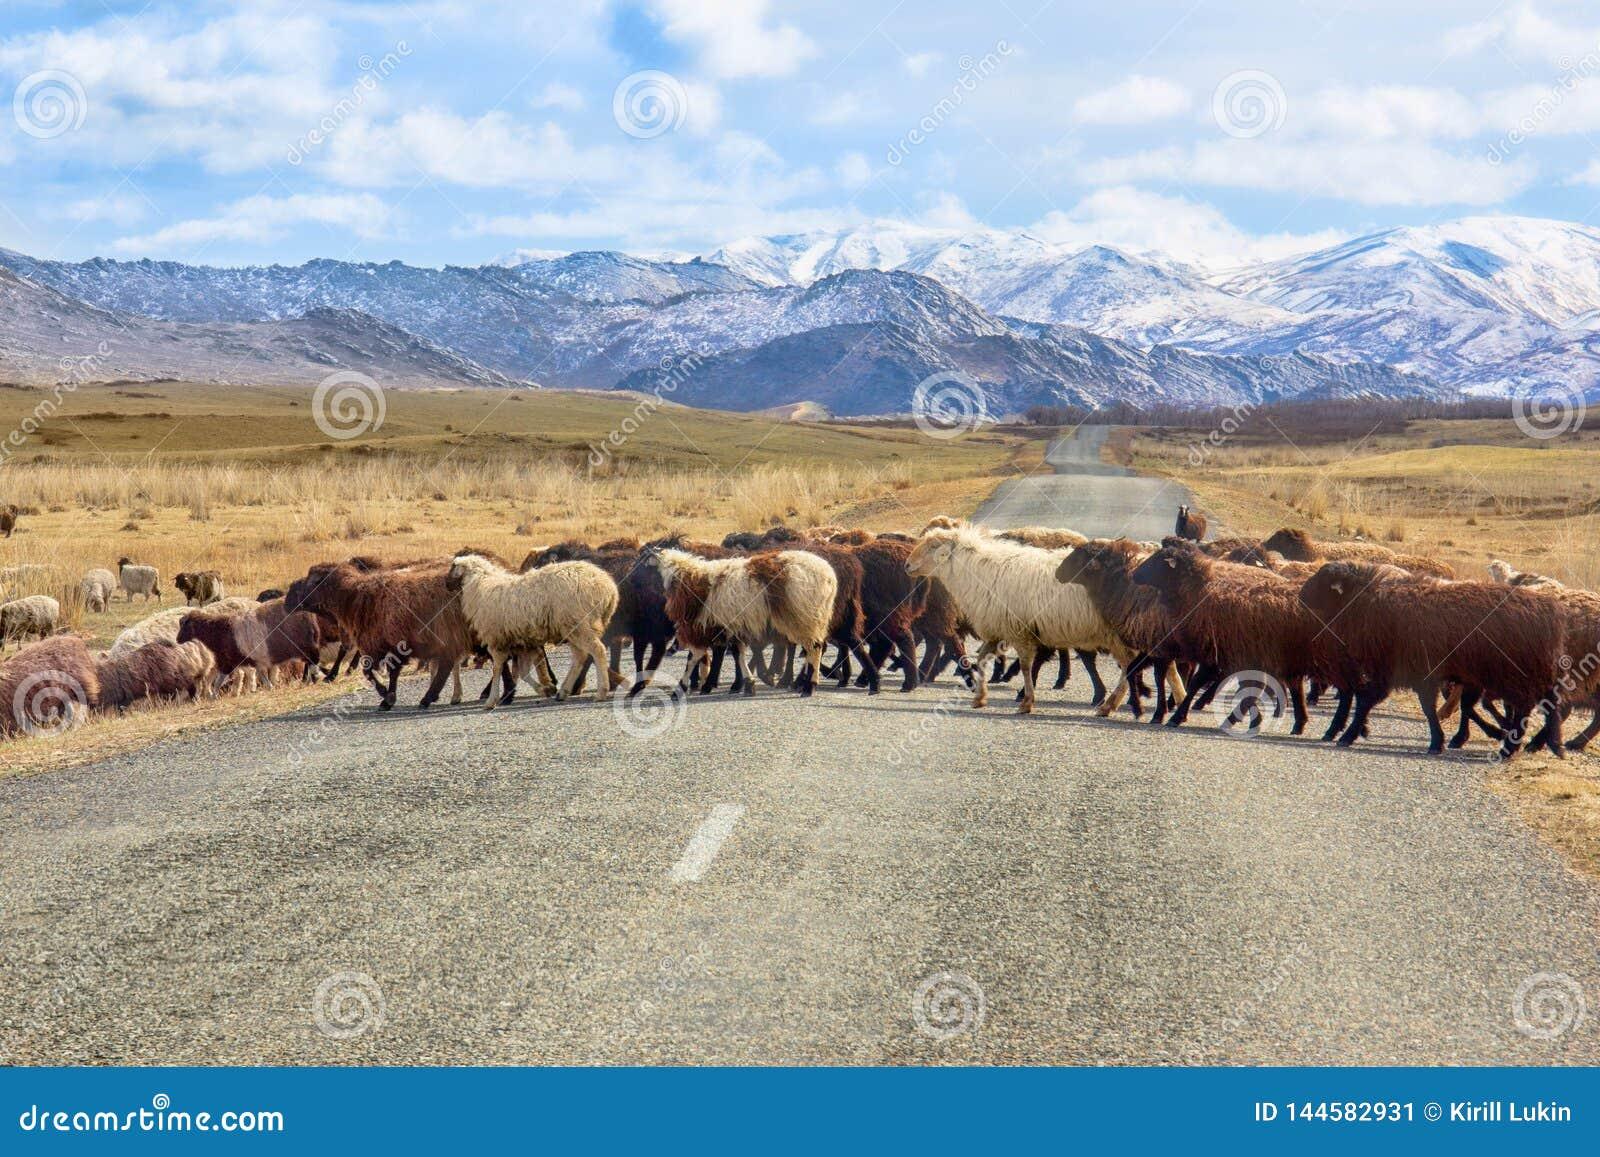 Овцы пересекают дорогу